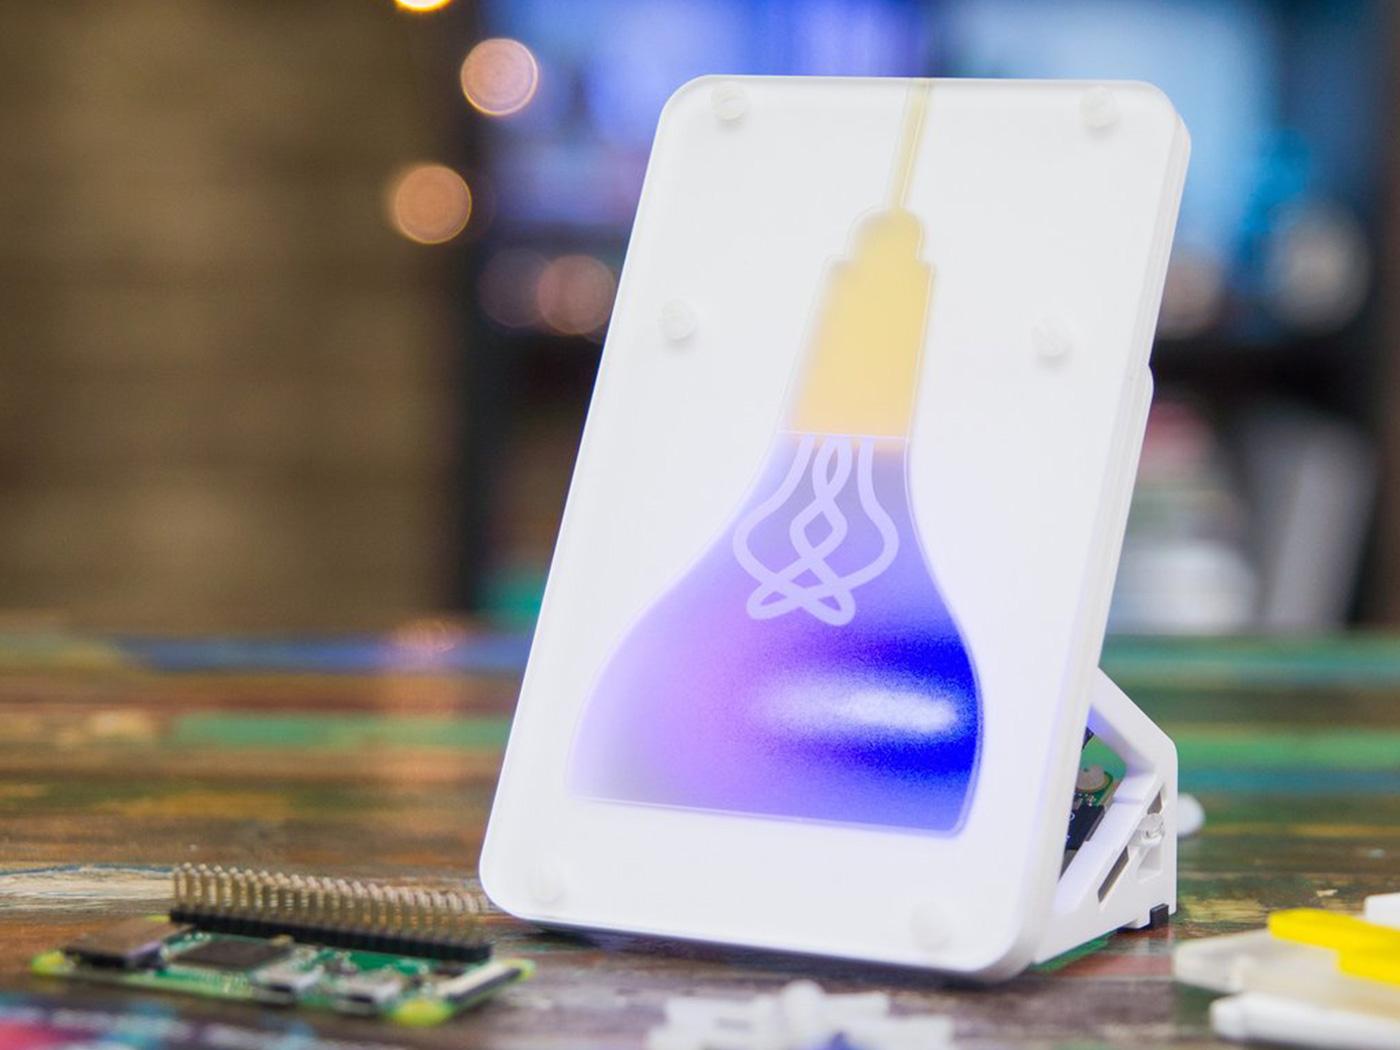 Pimoroni Mood Light - Pi Zero W Project Kit, internet-connected